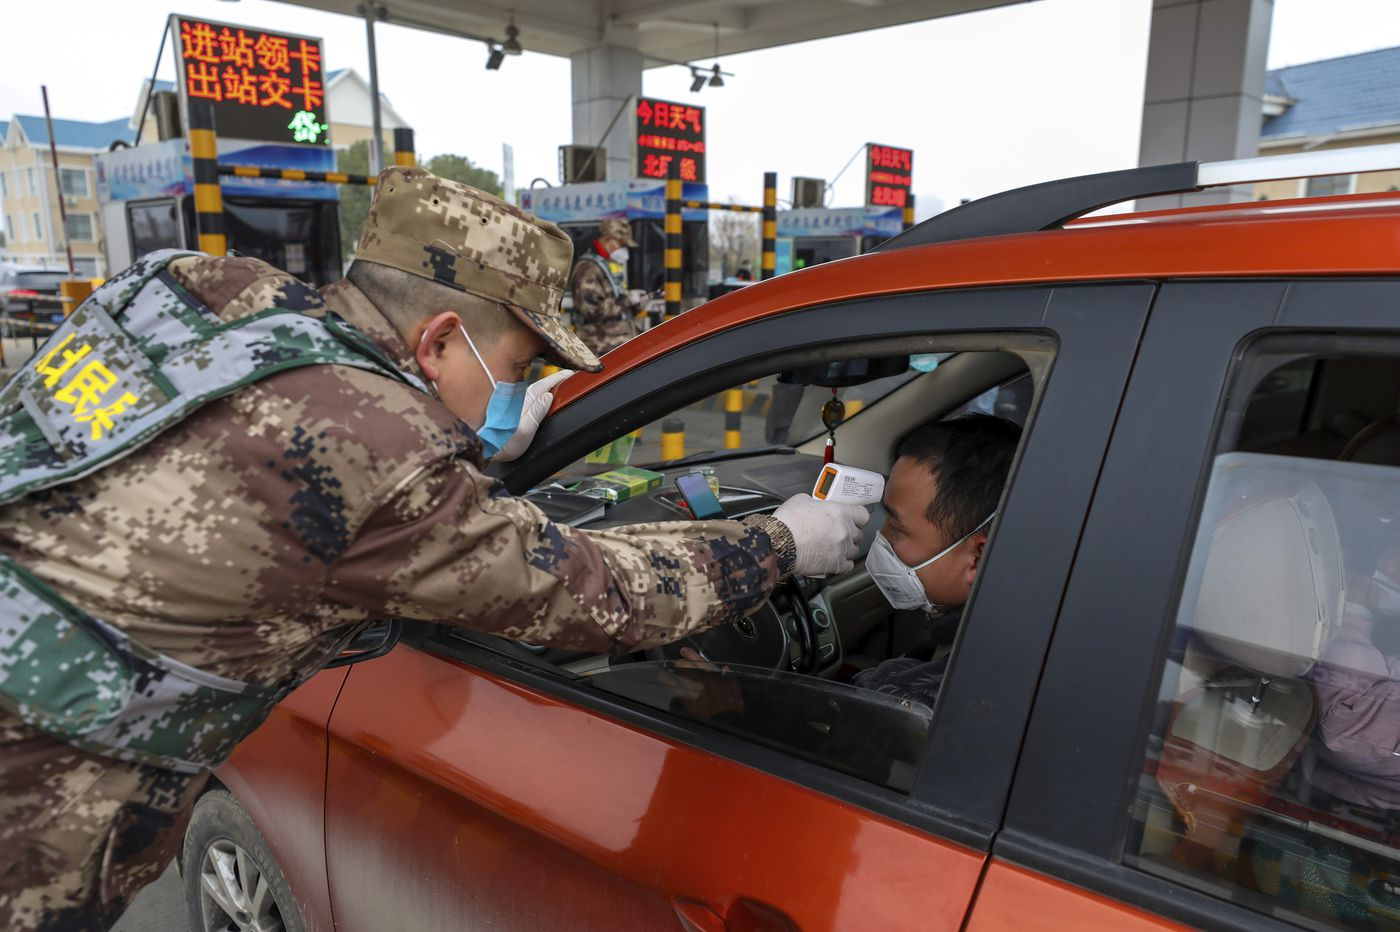 Travel ban halts flights between Wuhan and U.S., as airports prepare to screen passengers for coronavirus